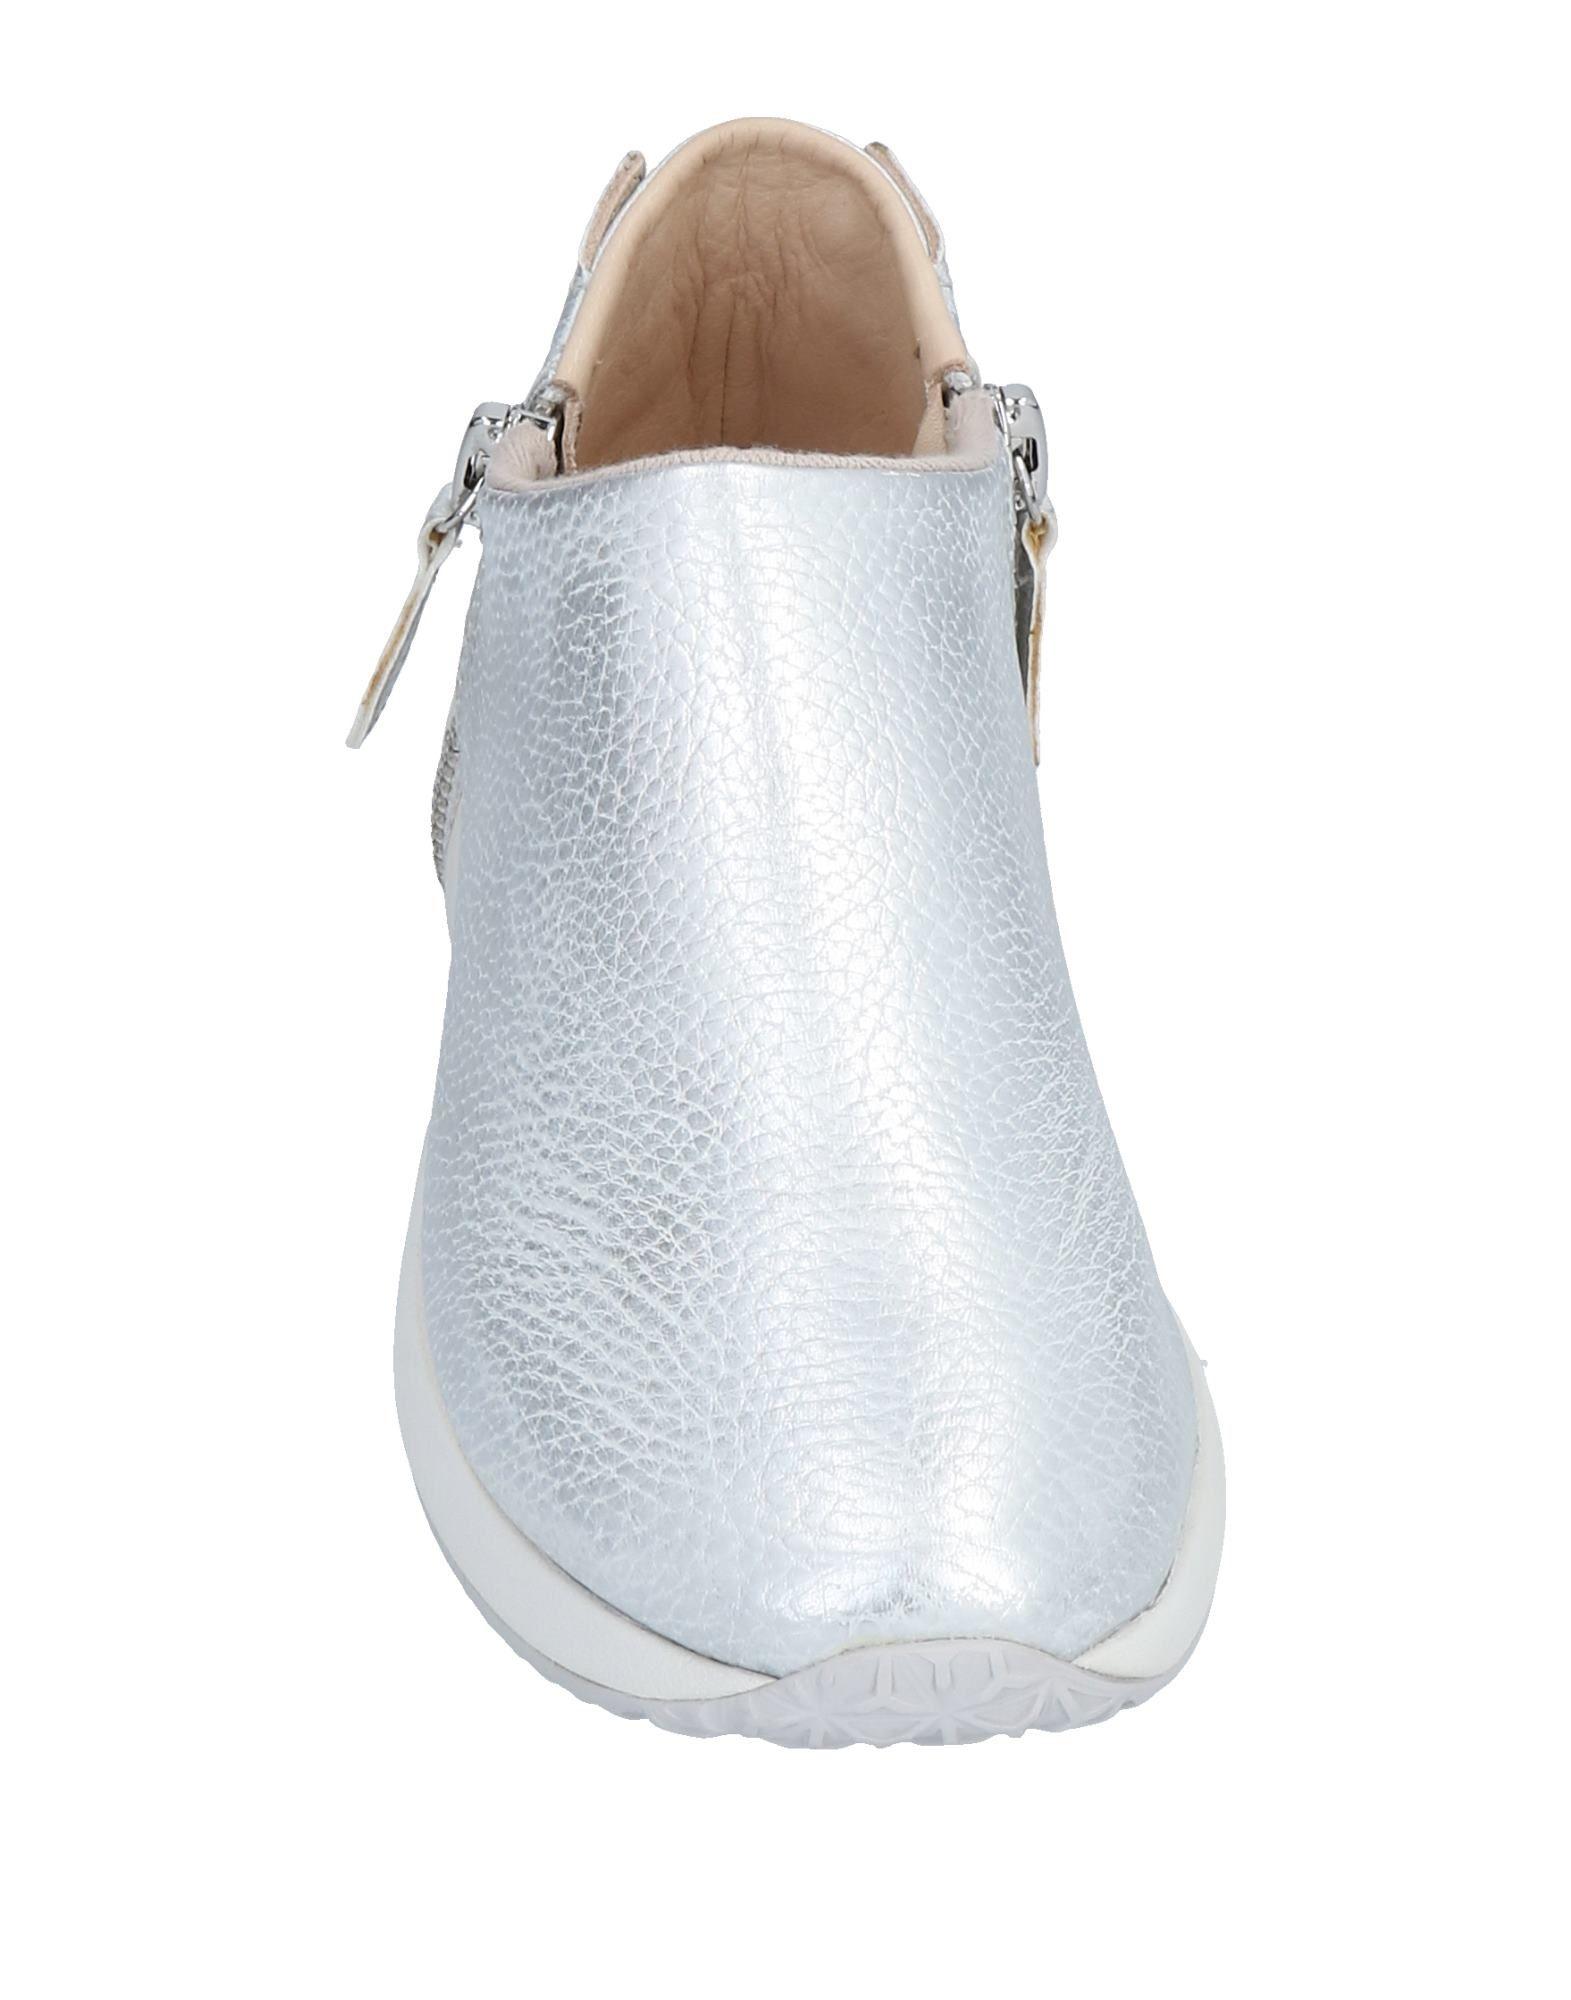 Diesel 11476625SR Sneakers Damen  11476625SR Diesel Gute Qualität beliebte Schuhe 95a5a0